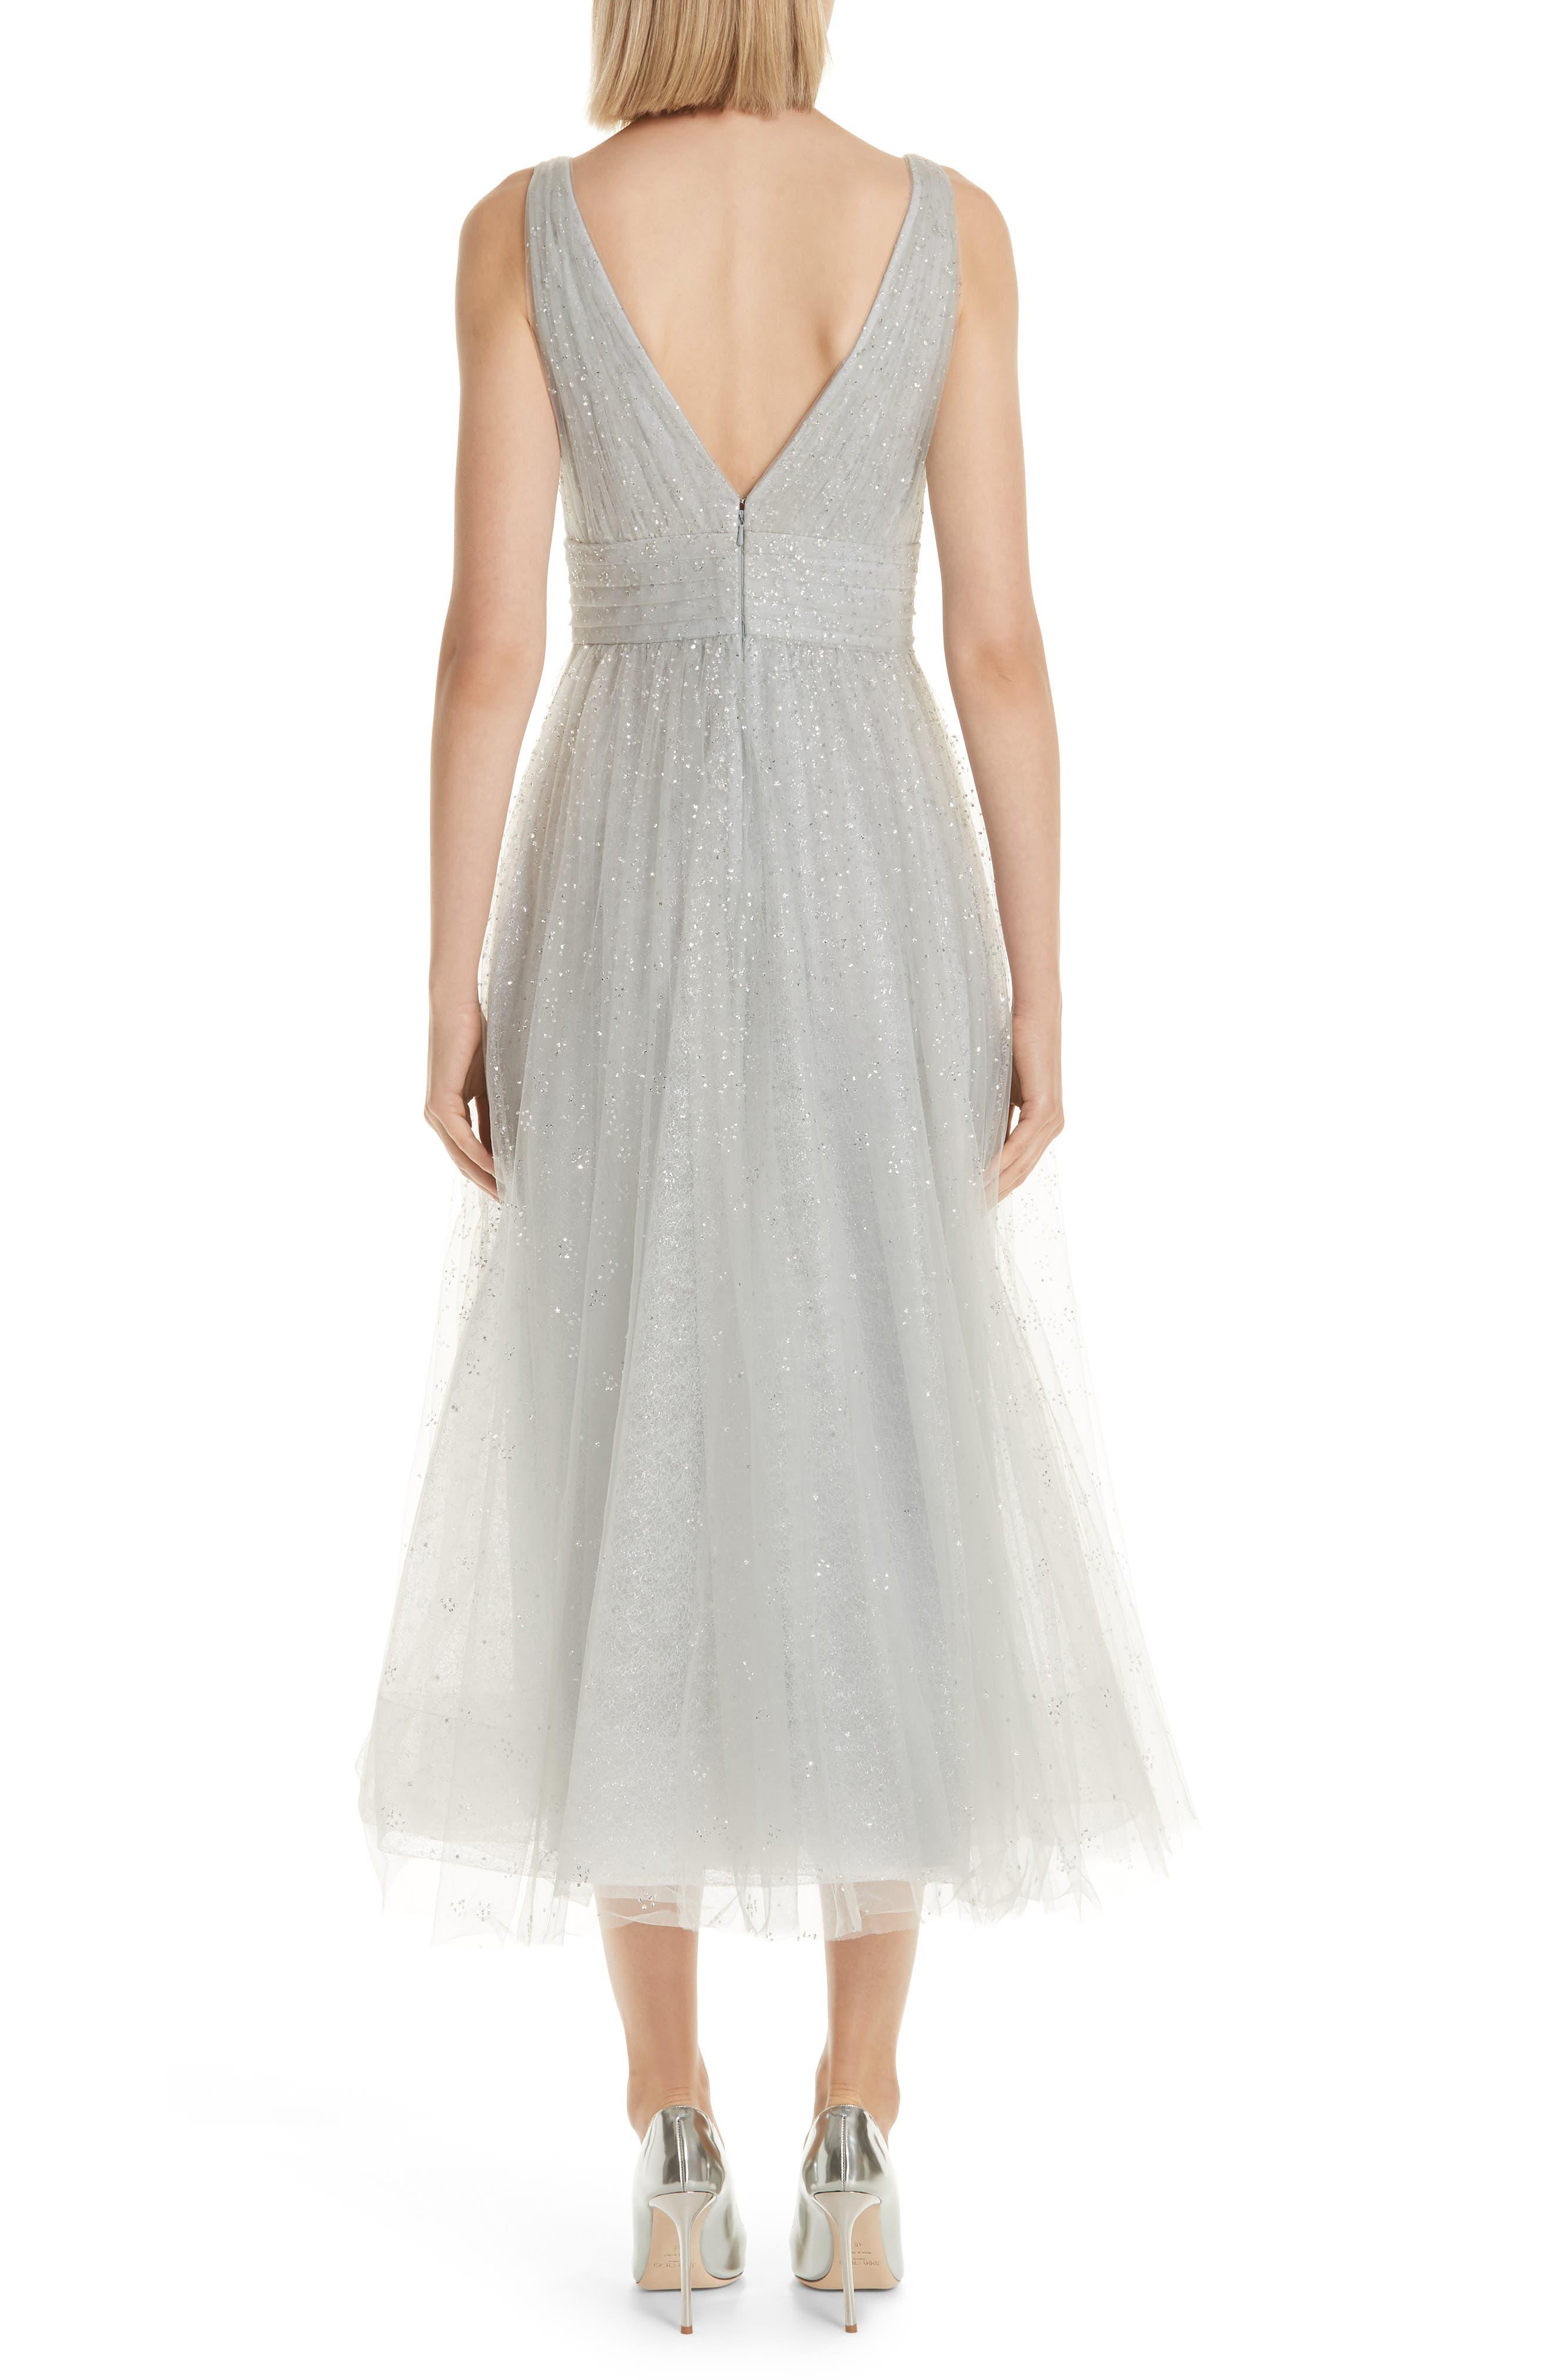 MARCHESA NOTTE,                             Glitter Tulle Tea Length Dress,                             Alternate thumbnail 2, color,                             SILVER